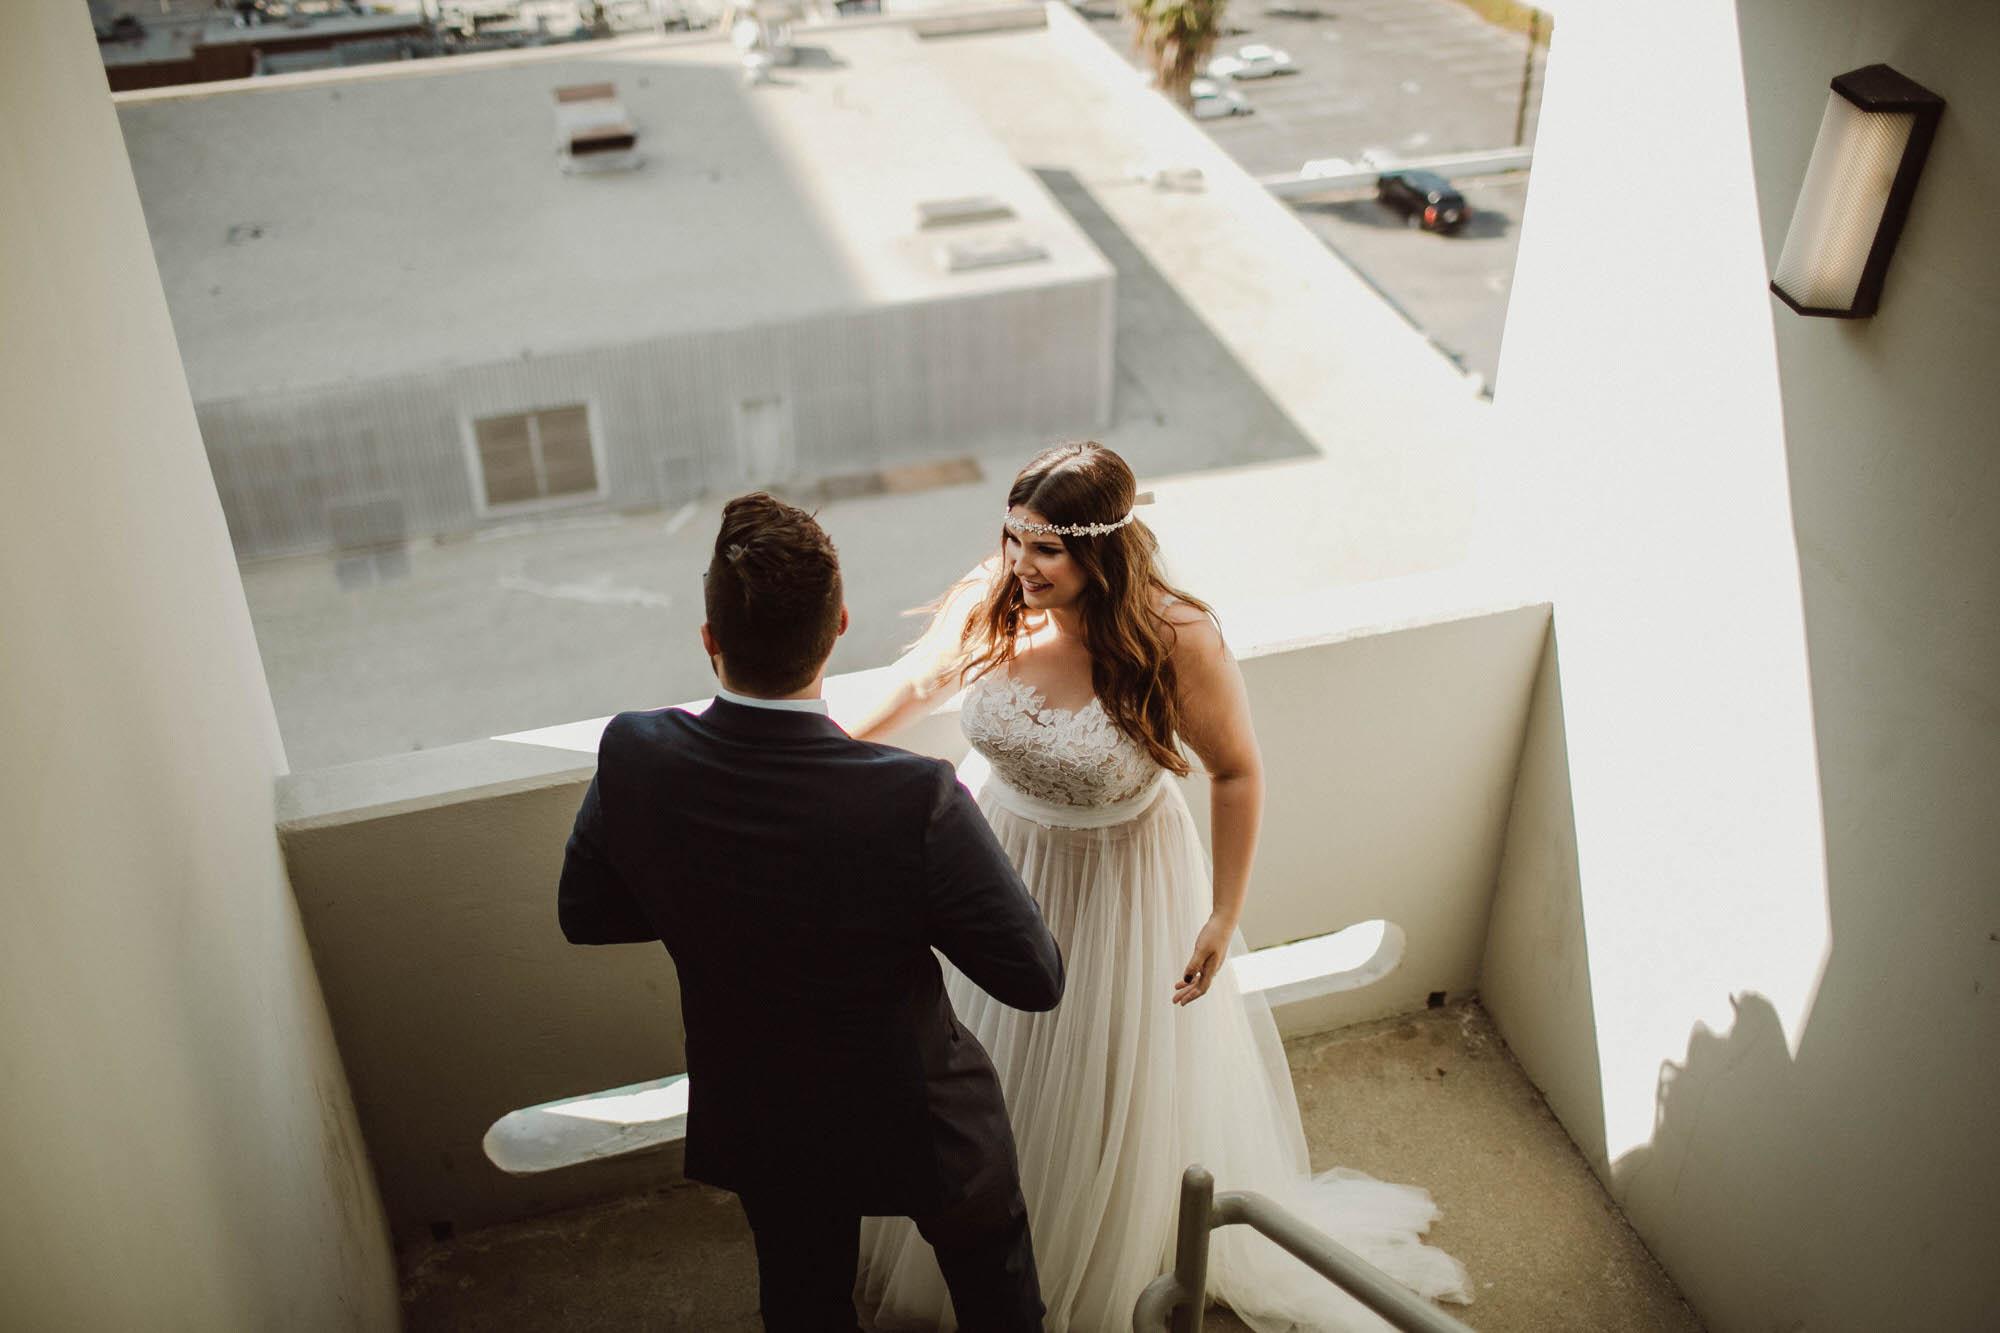 los-angeles-wedding-photographer-kristen-dylan-36.jpg